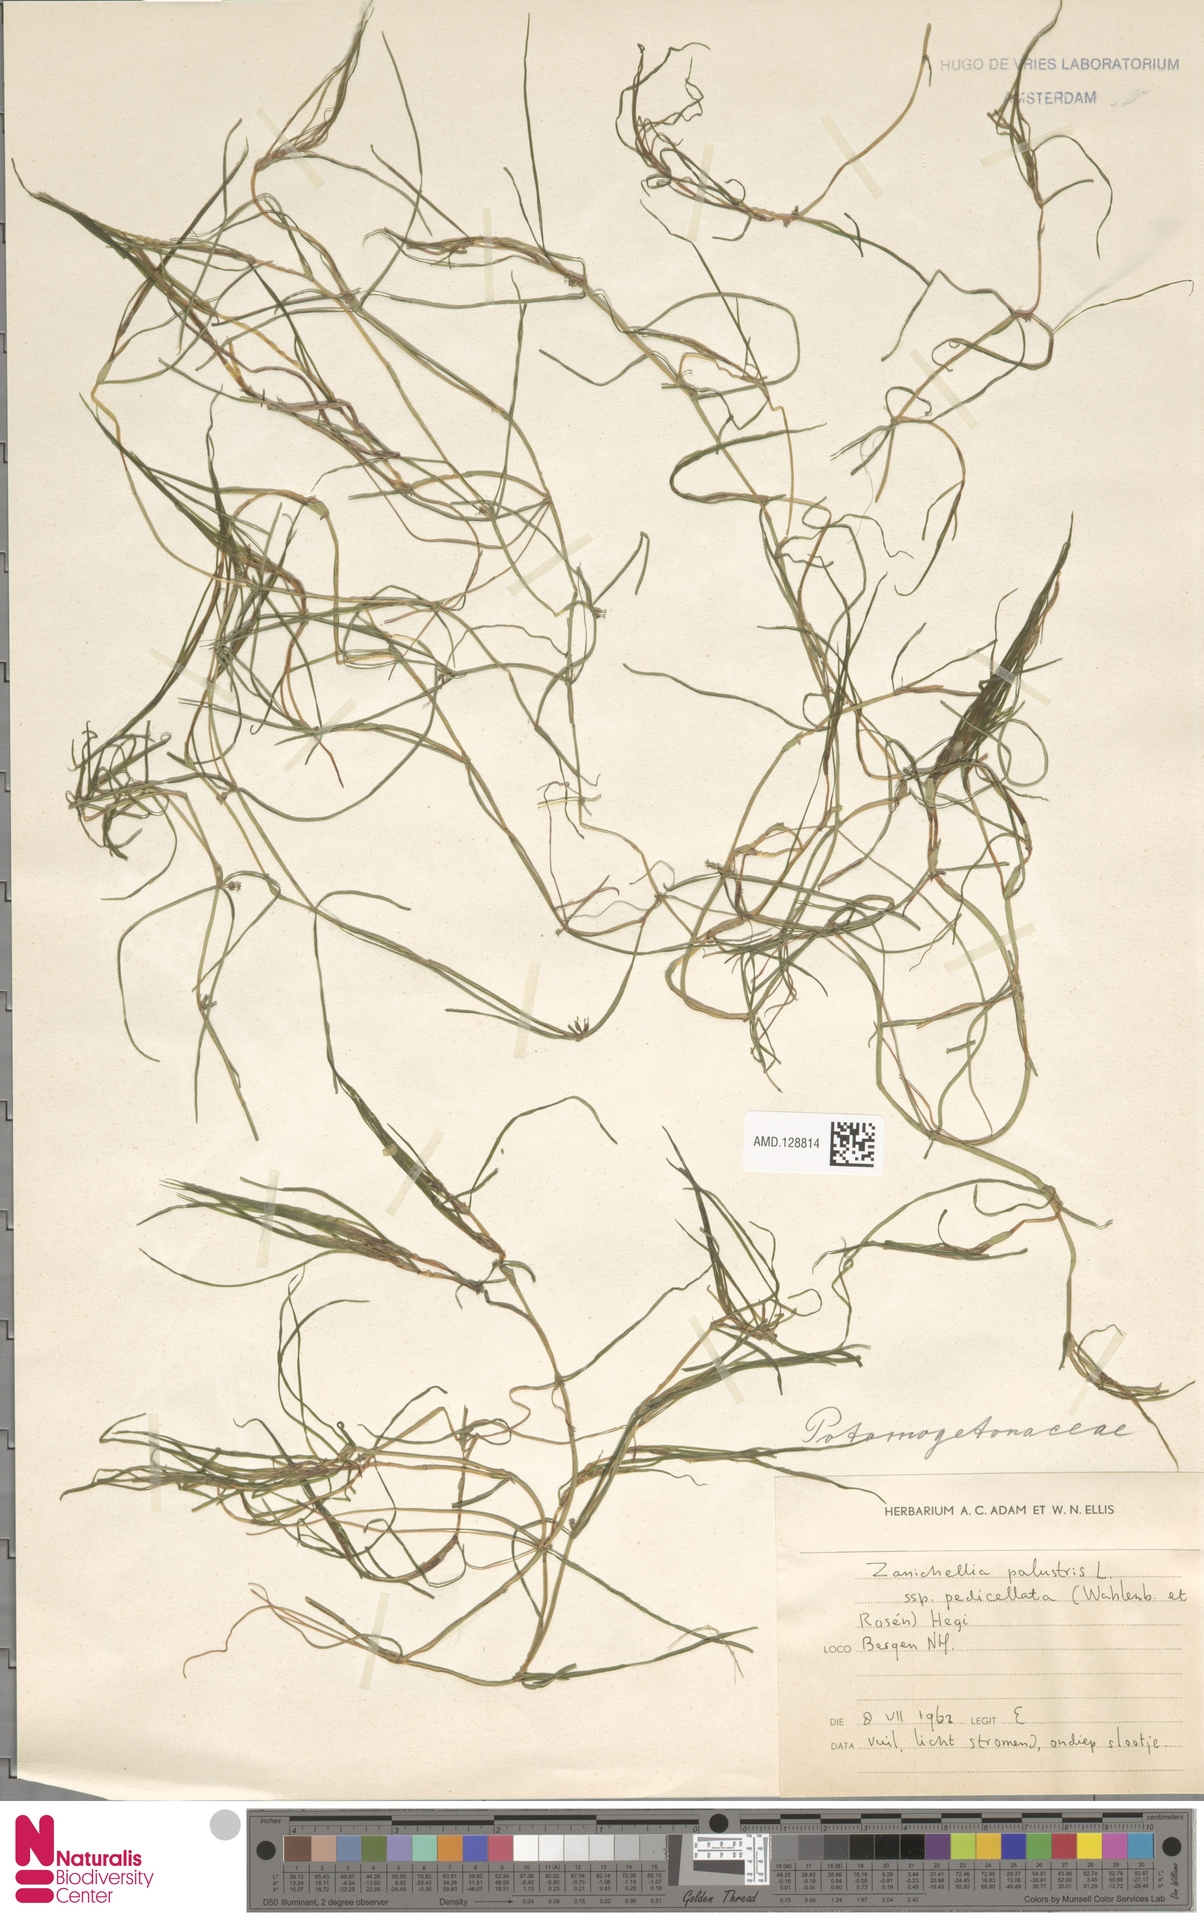 AMD.128814 | Zannichellia palustris subsp. pedicellata (Wahlenb. & Rosén) Hook.f.